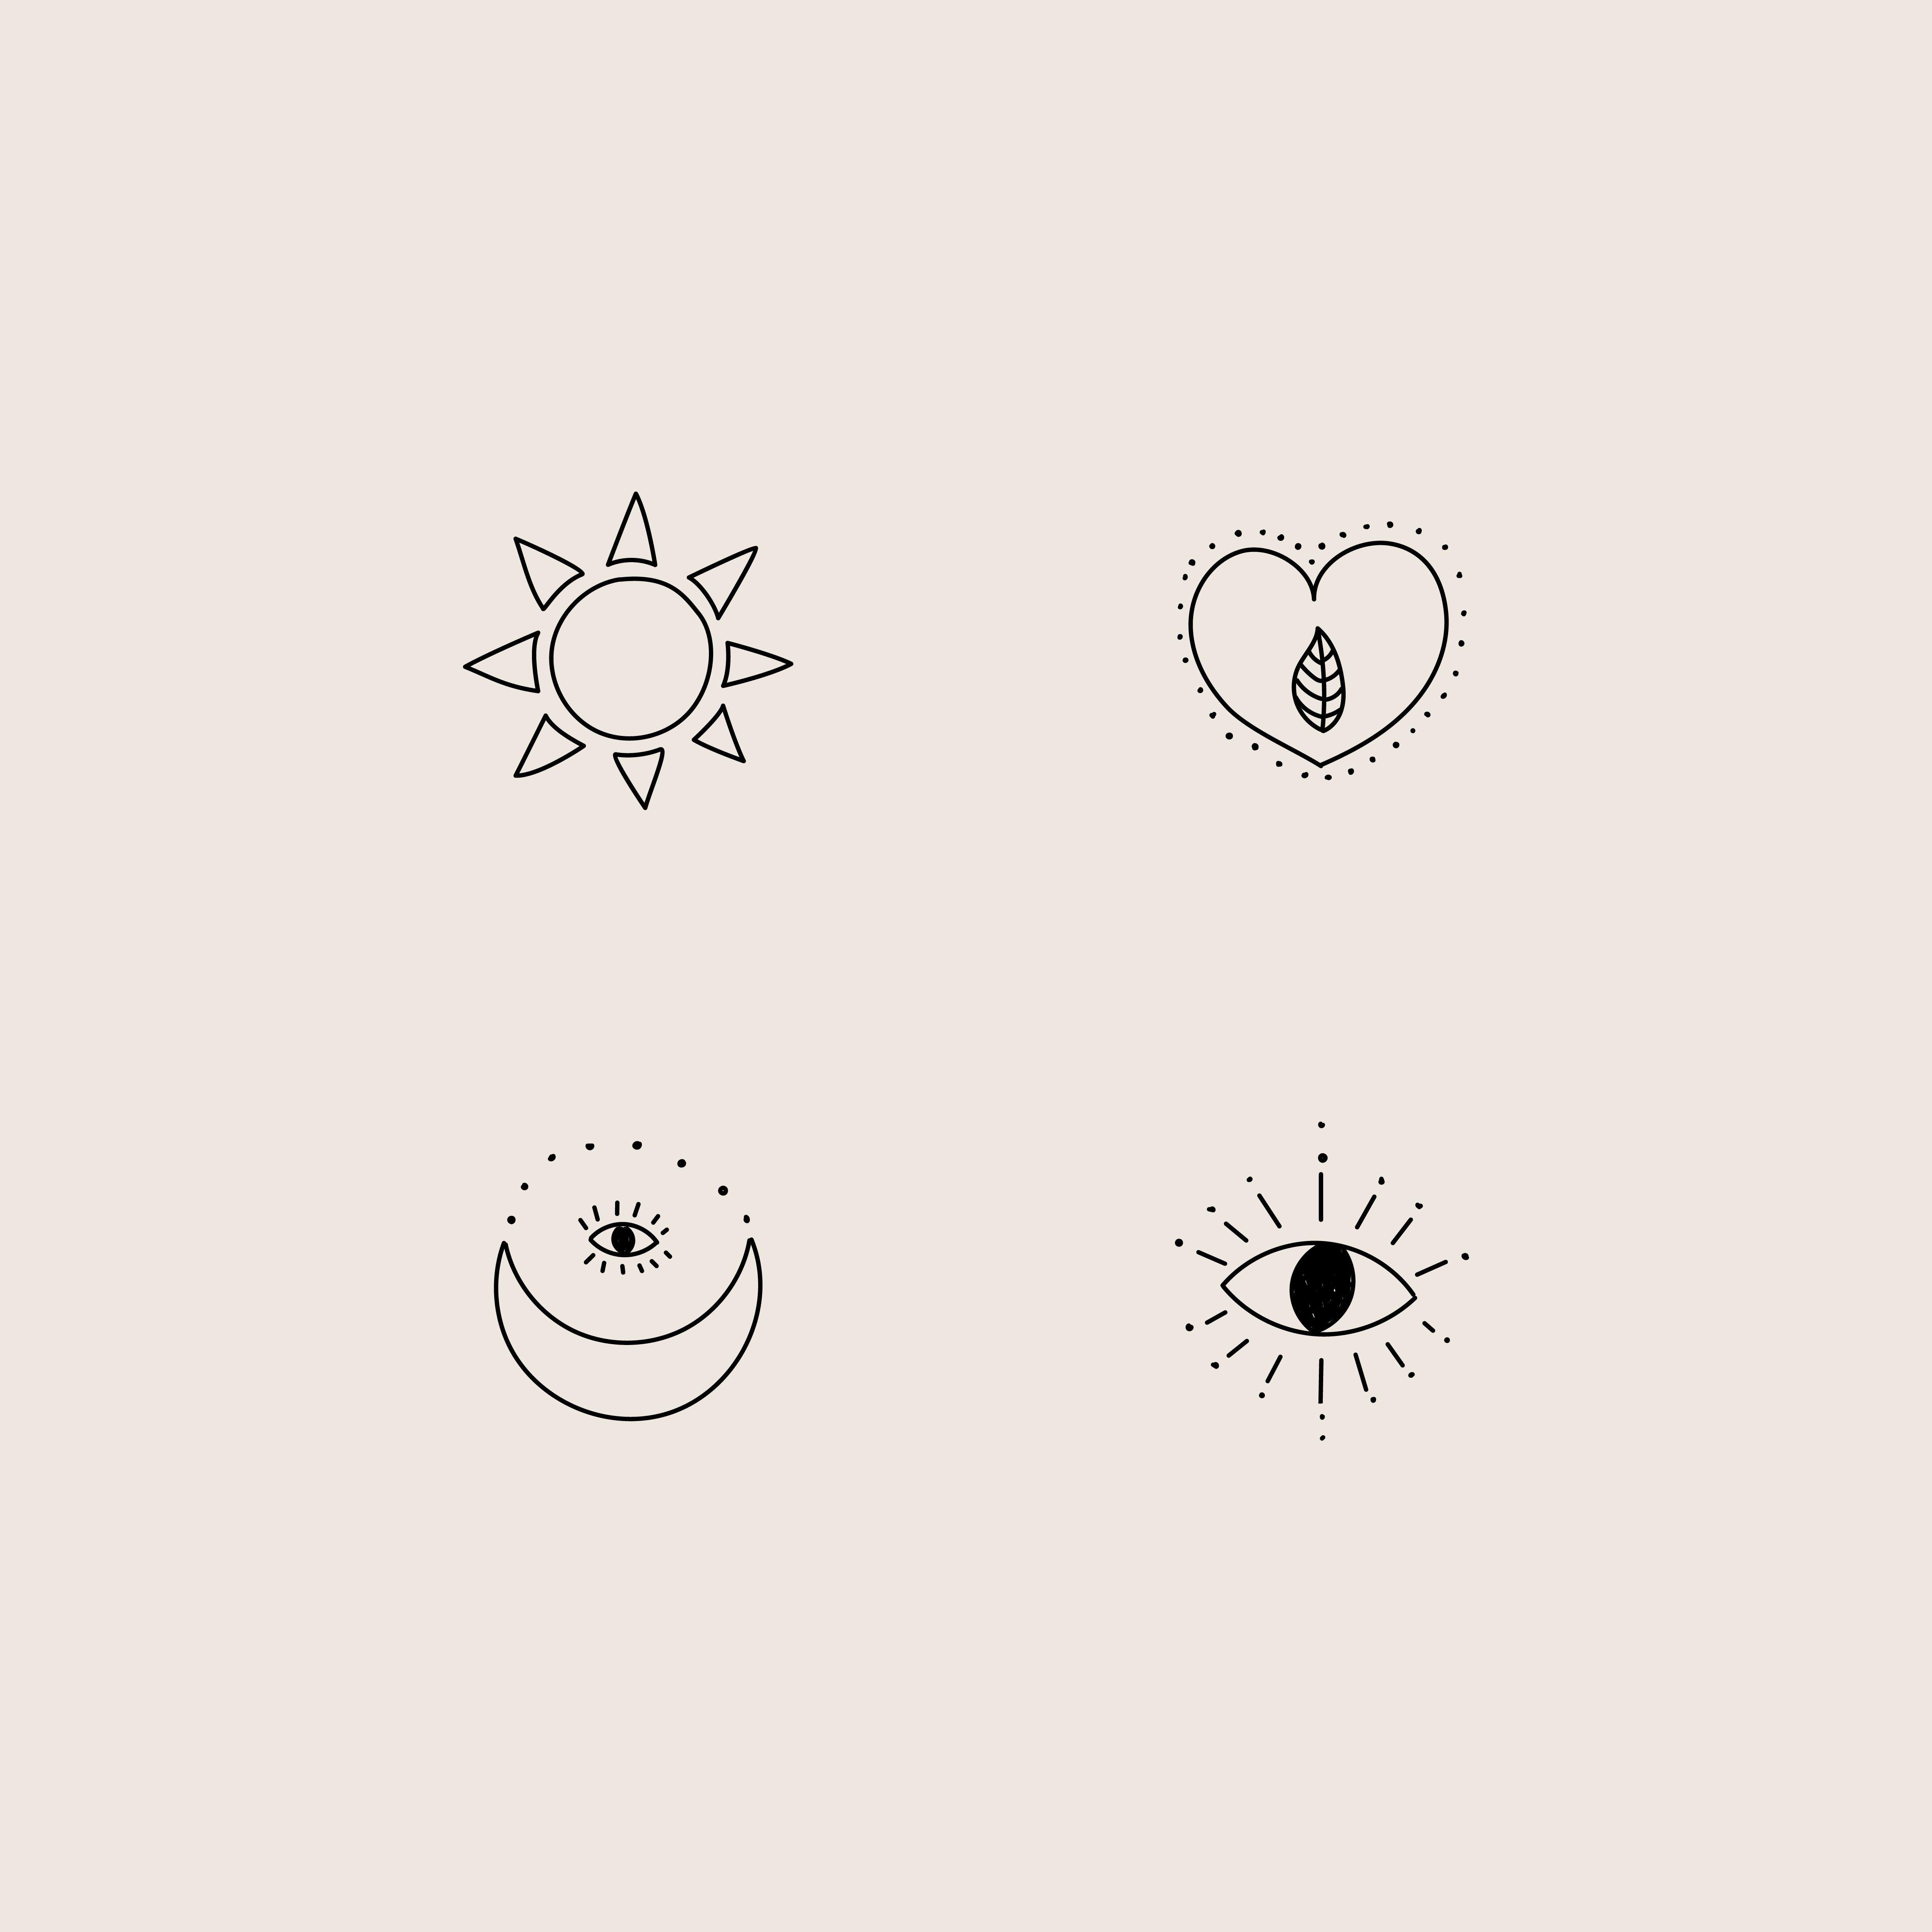 Illustration Moon Sun Eye Heart Leaf Leaves Design Logos Premade Logo Digital Portefolio Inspiration Diseno Grafico Vinet Small Tattoos Moon Tattoo Sun Tattoos